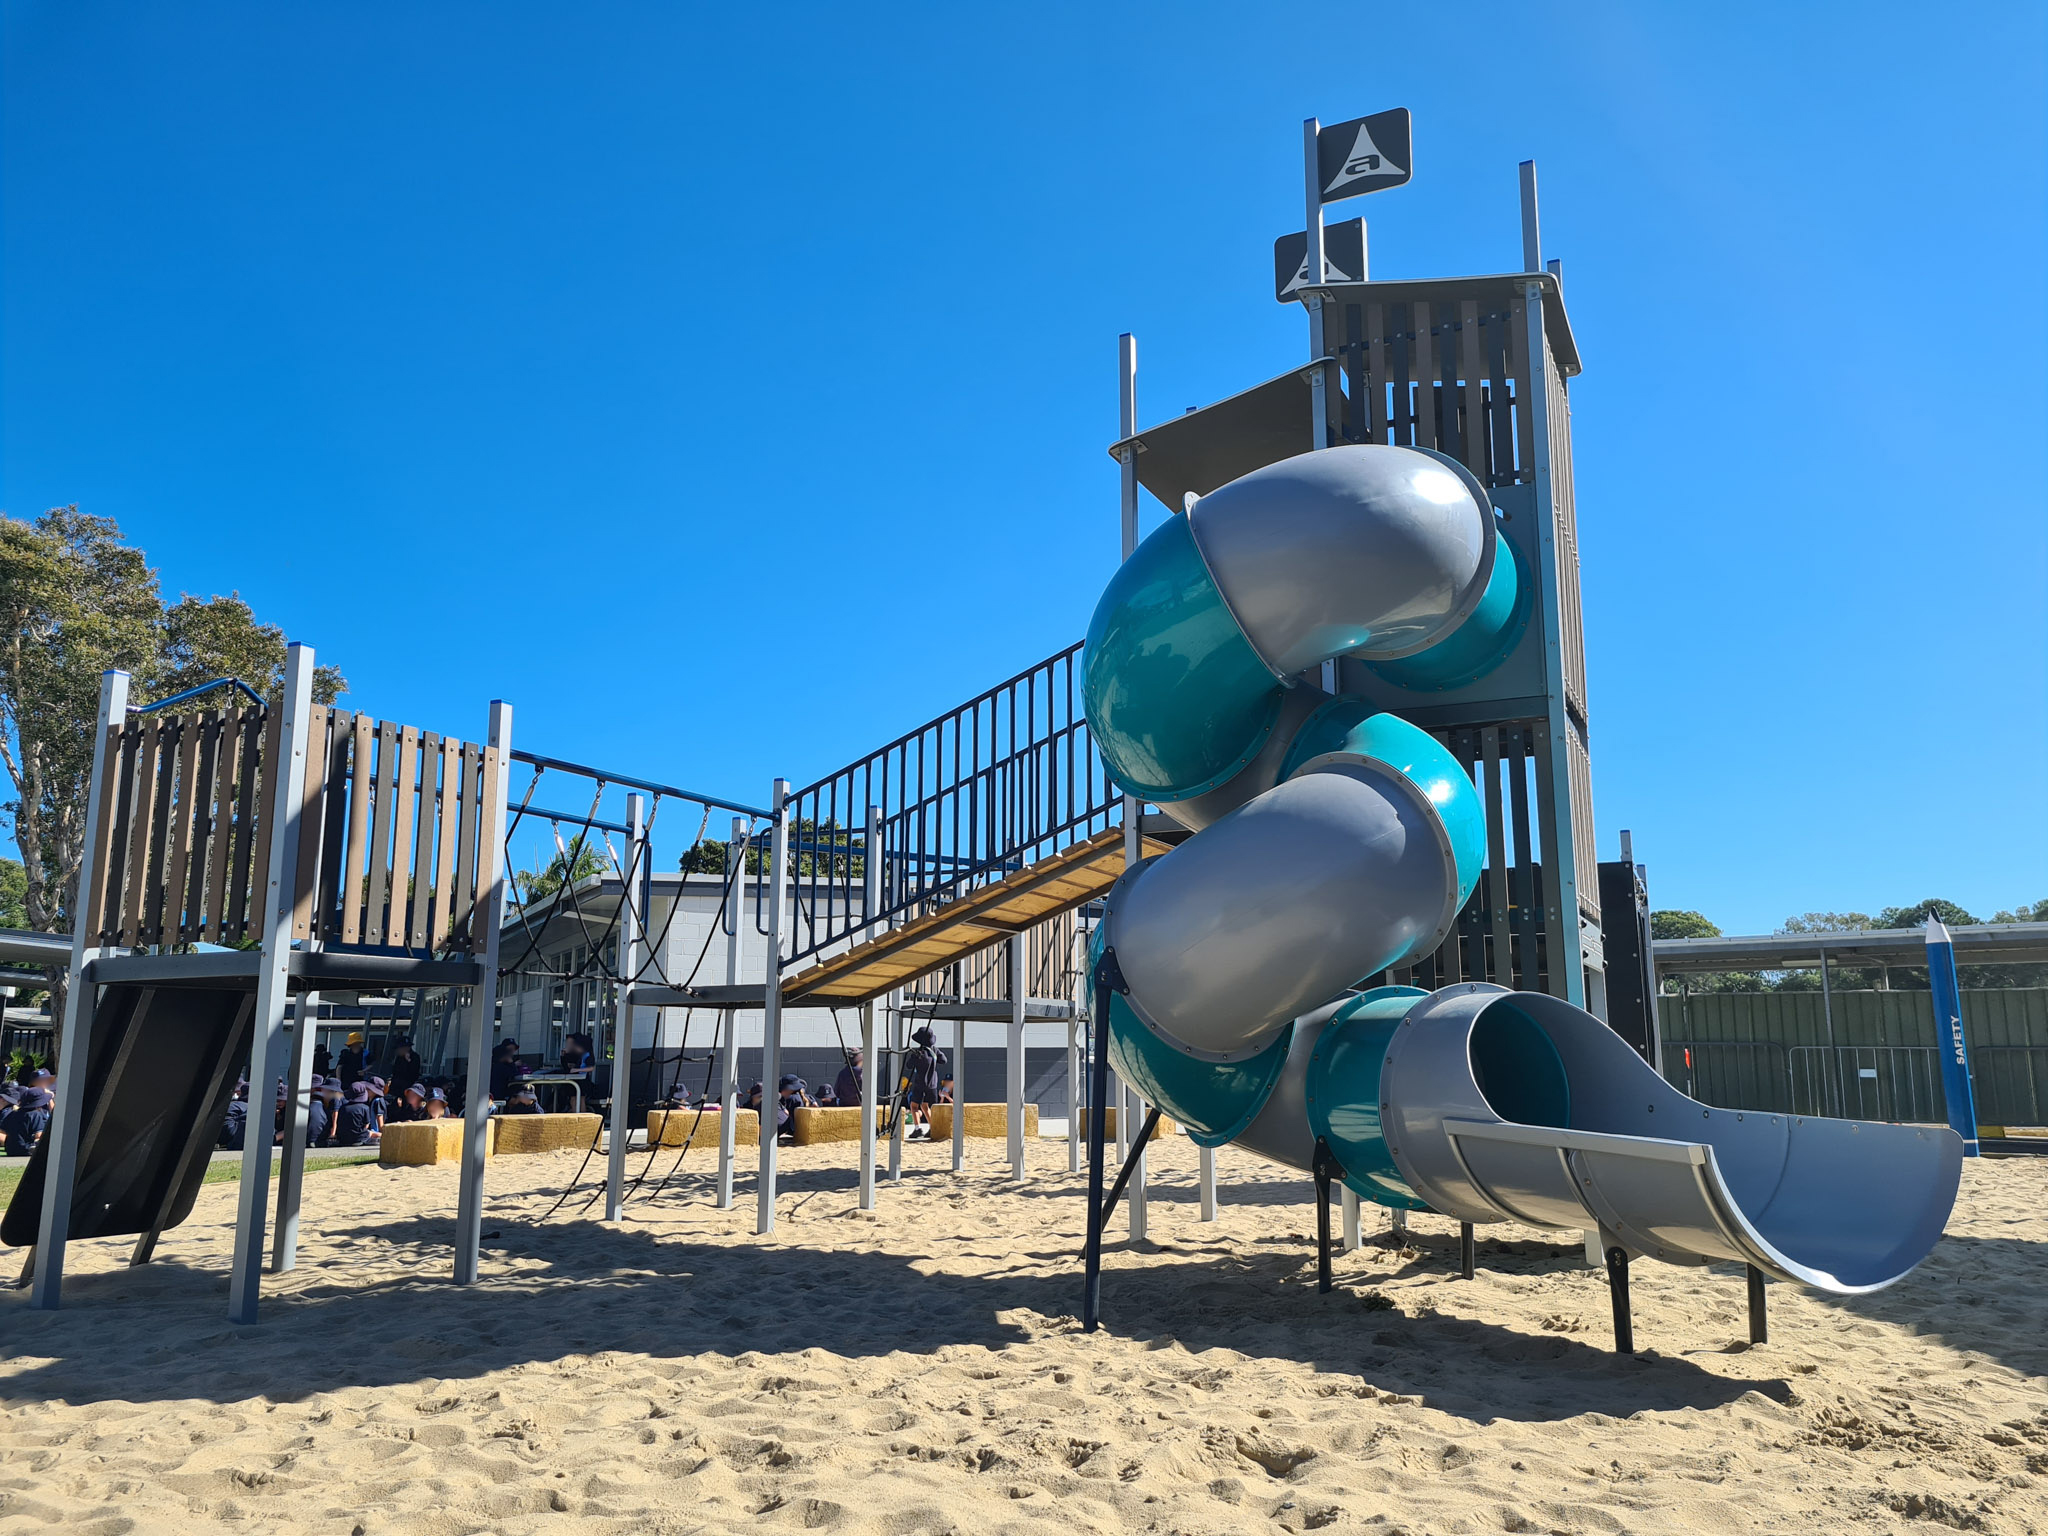 palm-beach-state-school-playrground-austek-play-01